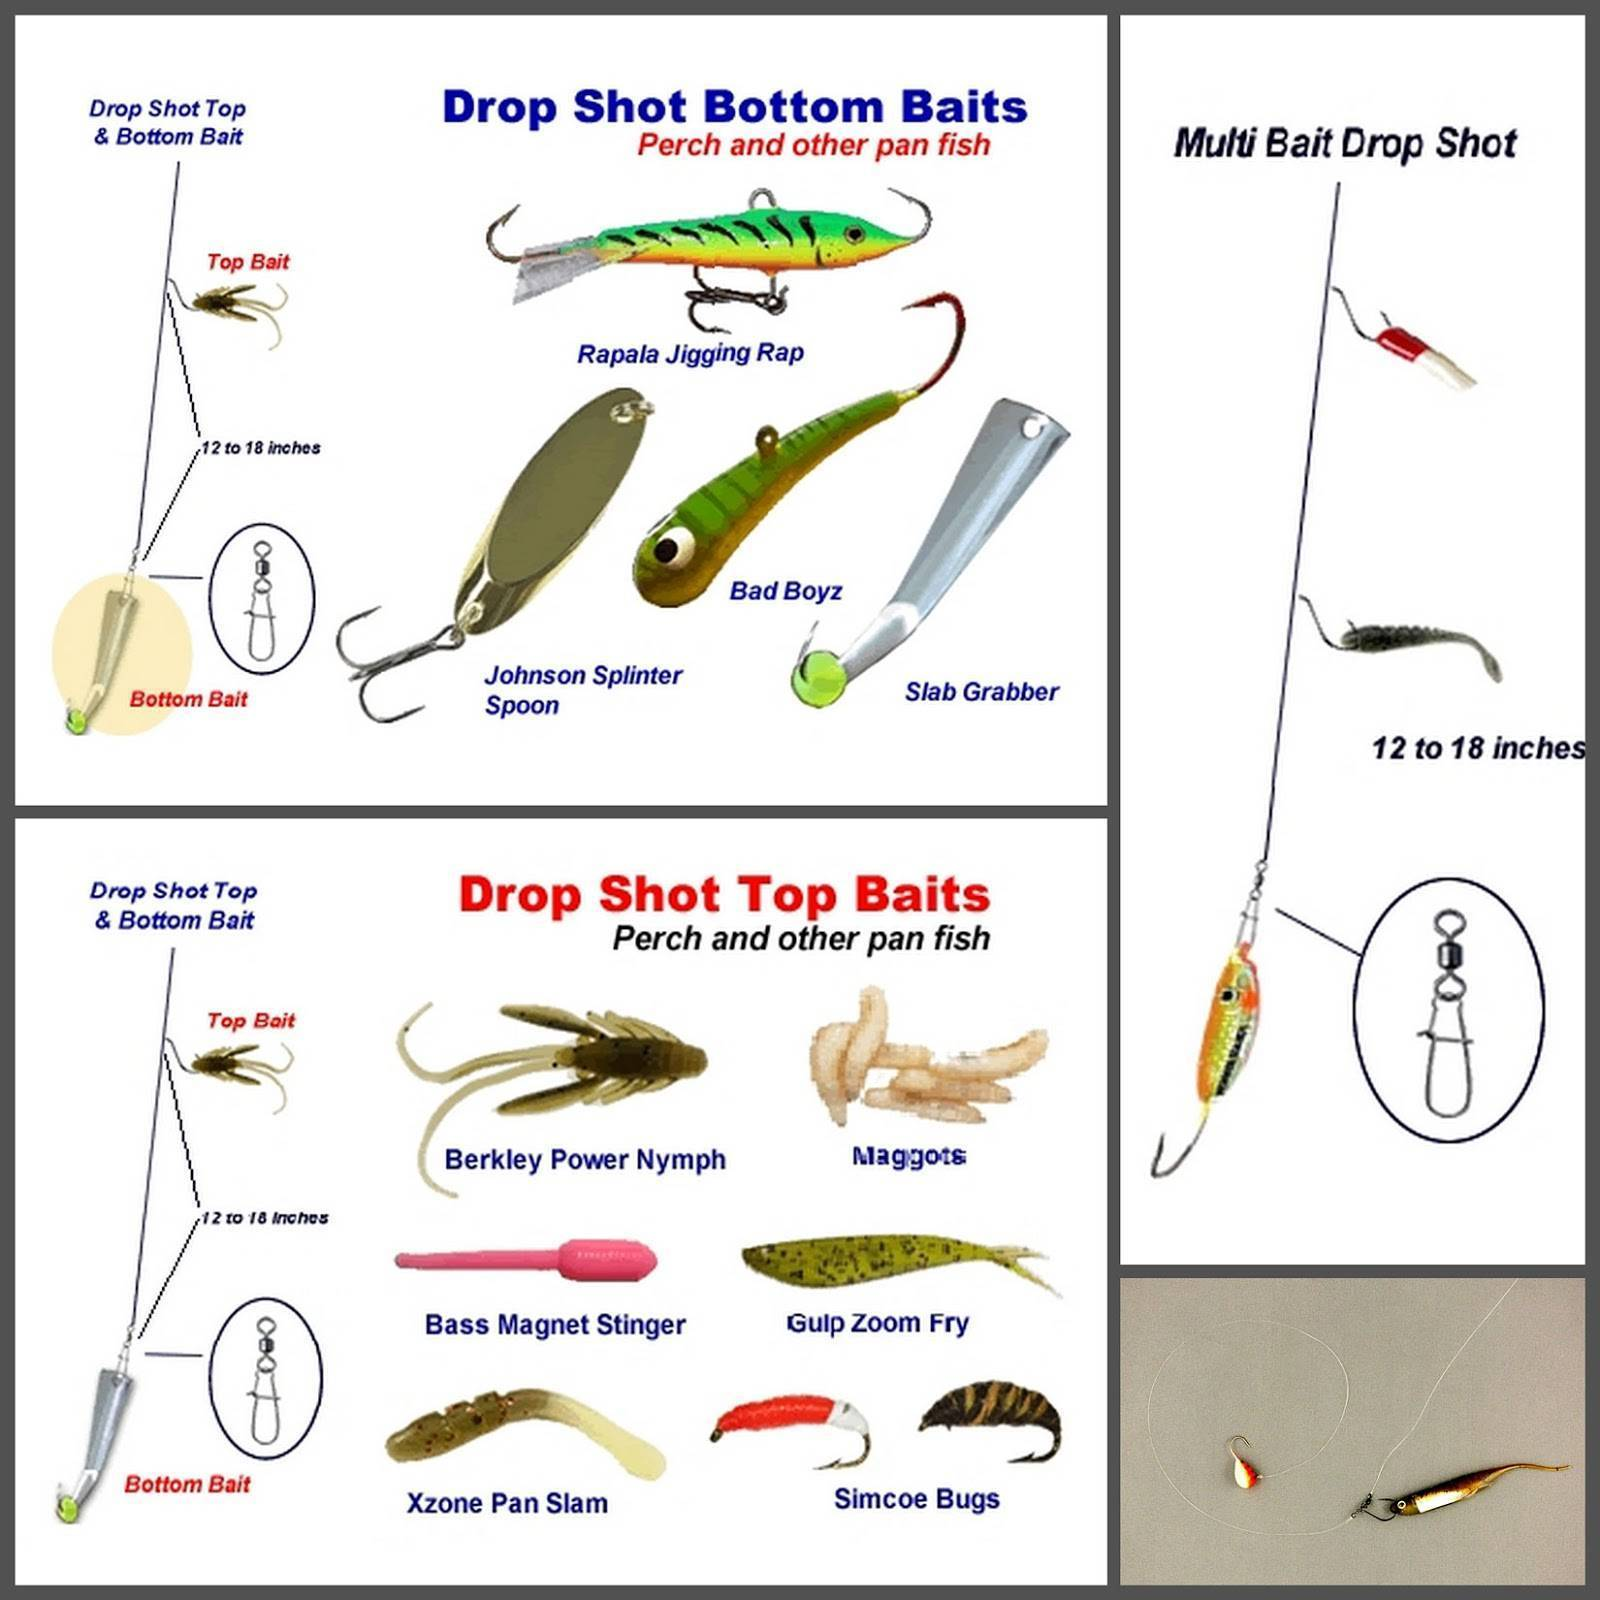 Оснастка дроп-шот для ловли хищника на ахтубе